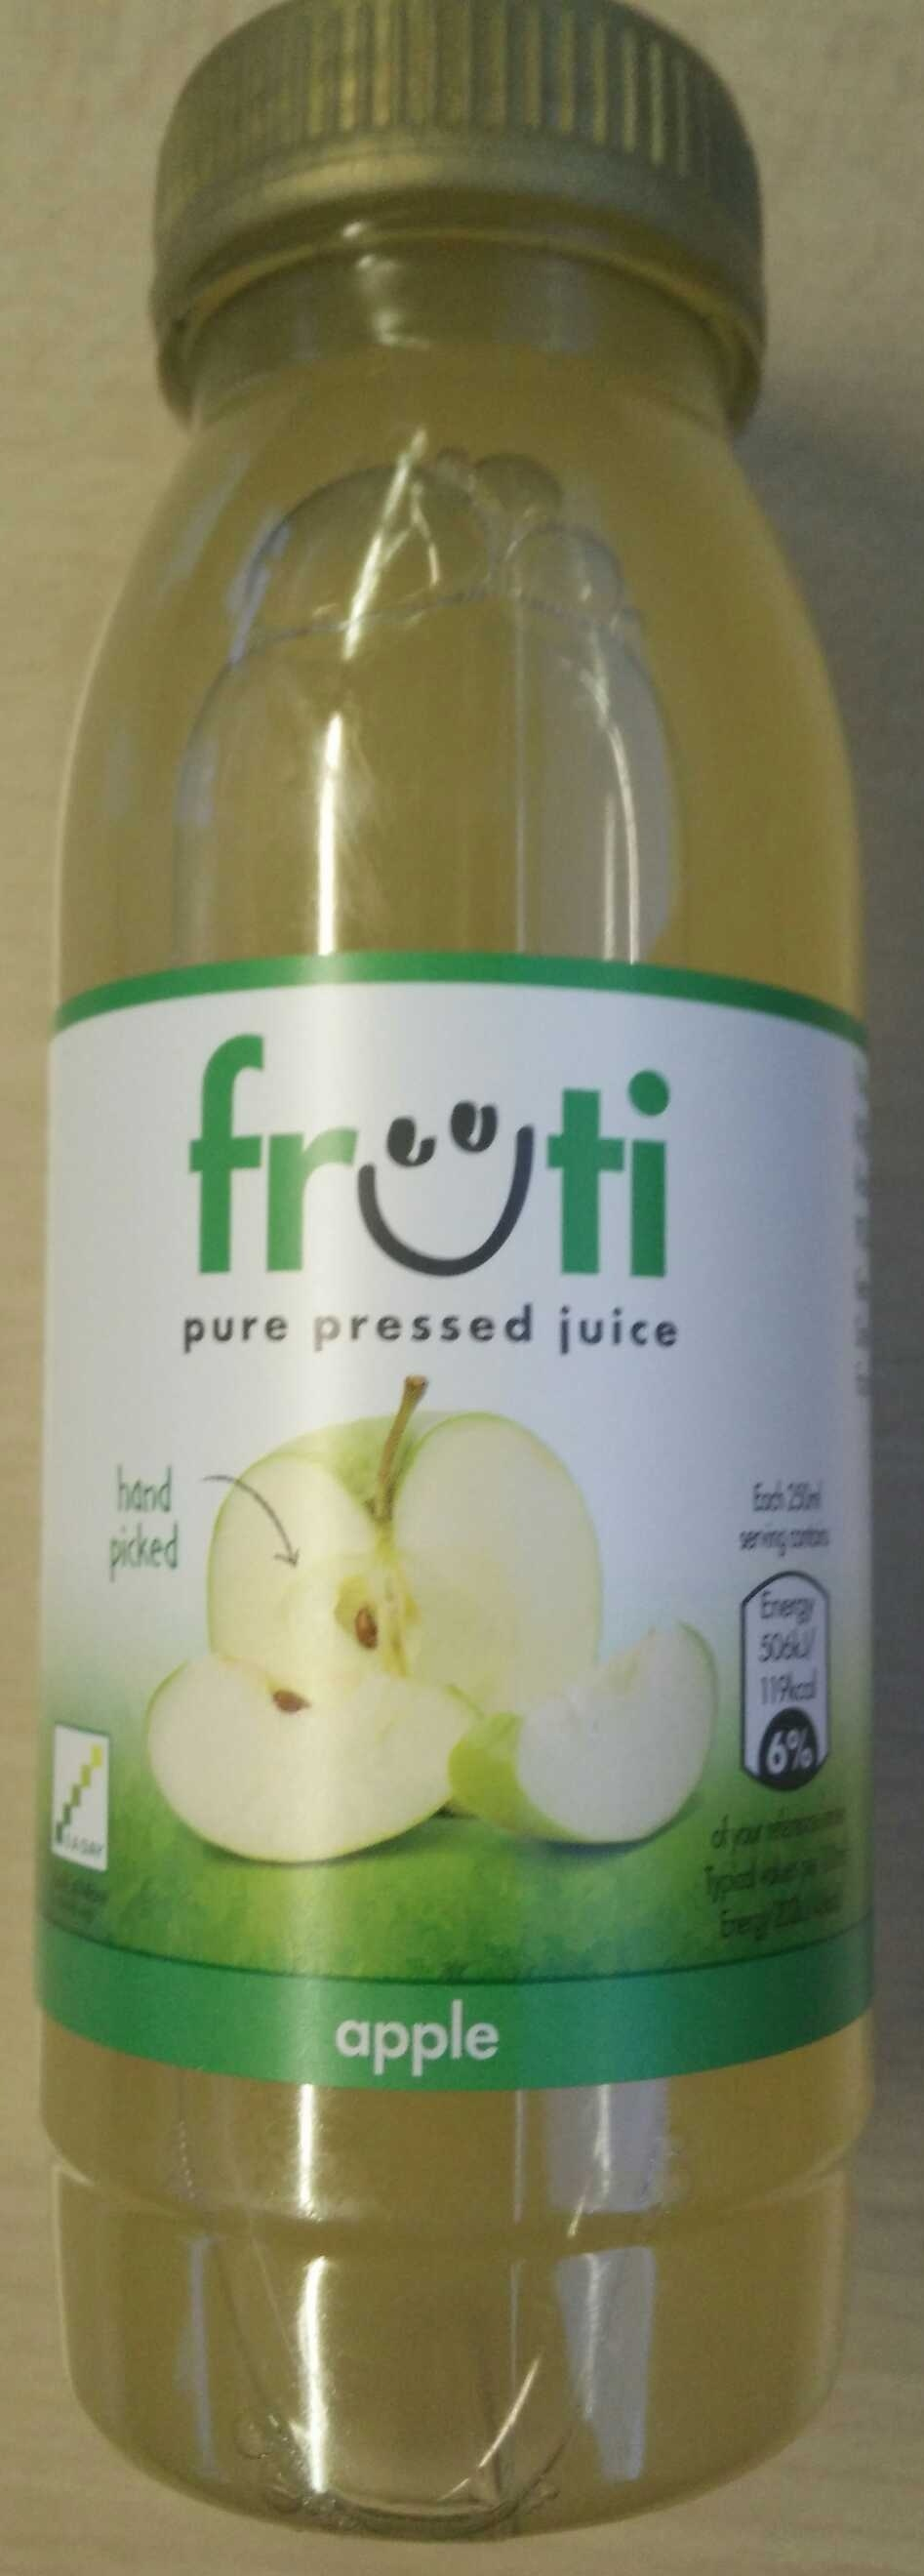 Pure pressed juice - Apple - Produit - en